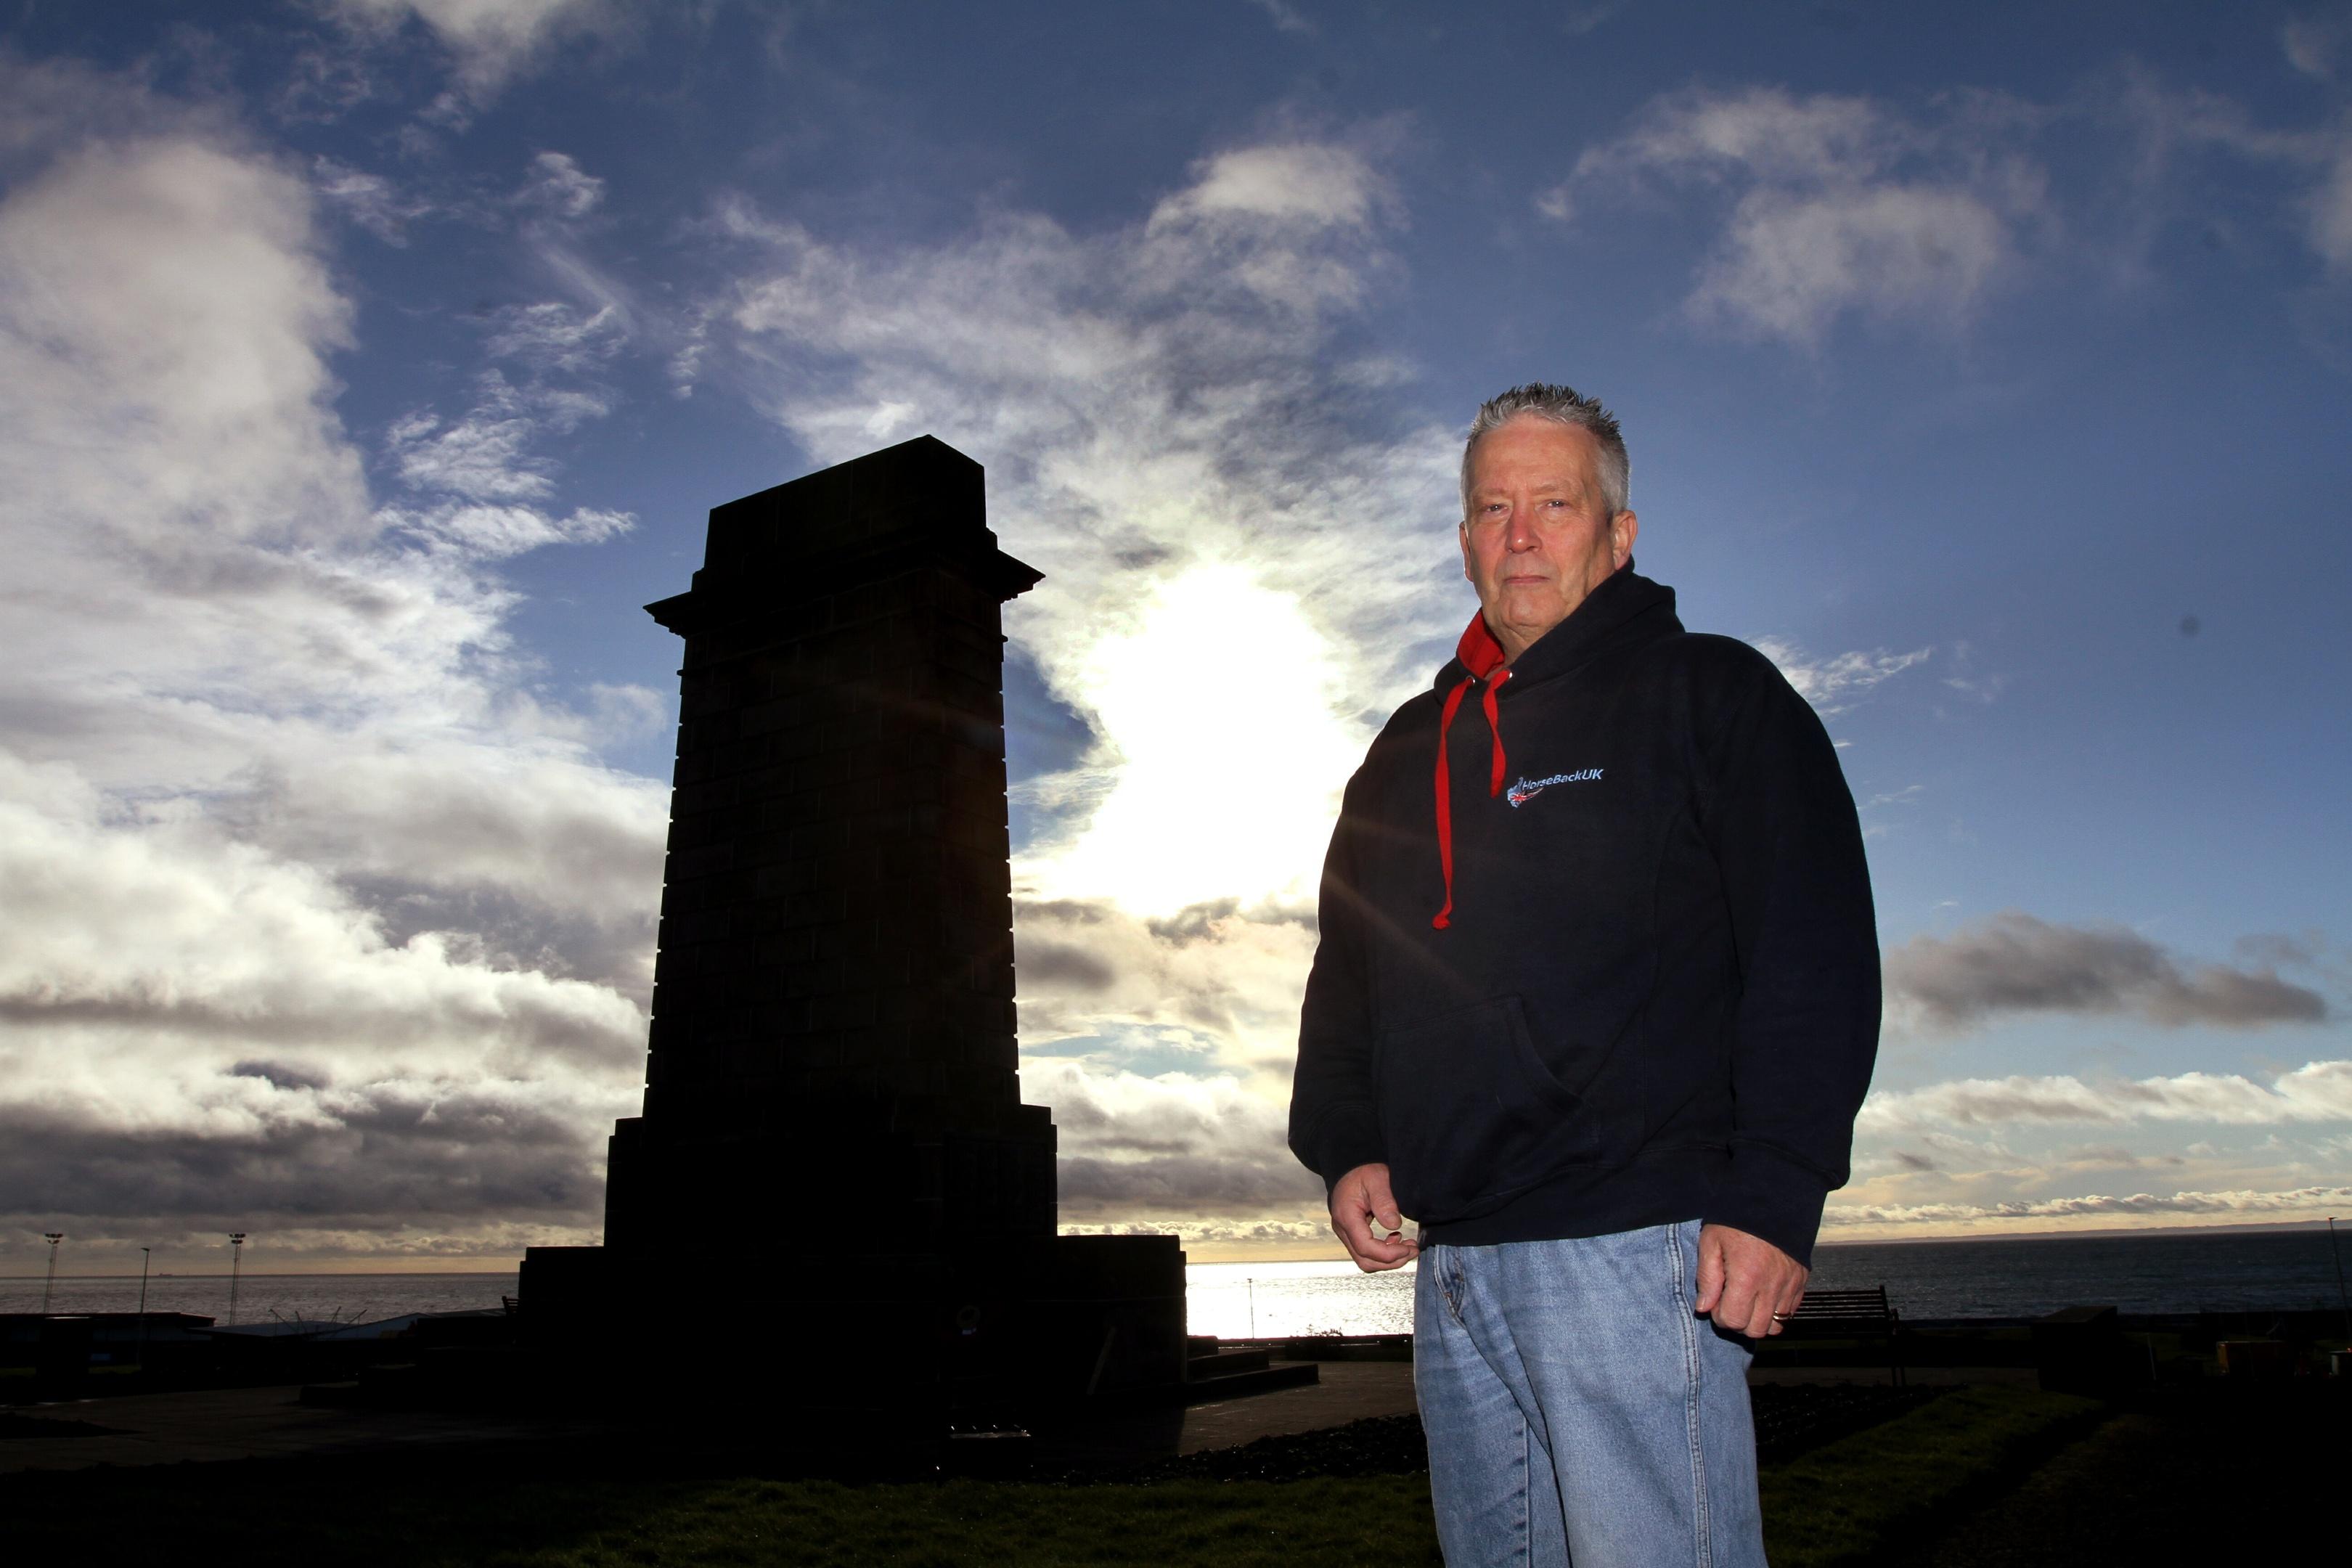 Ian Wren at the Arbroath war memorial.